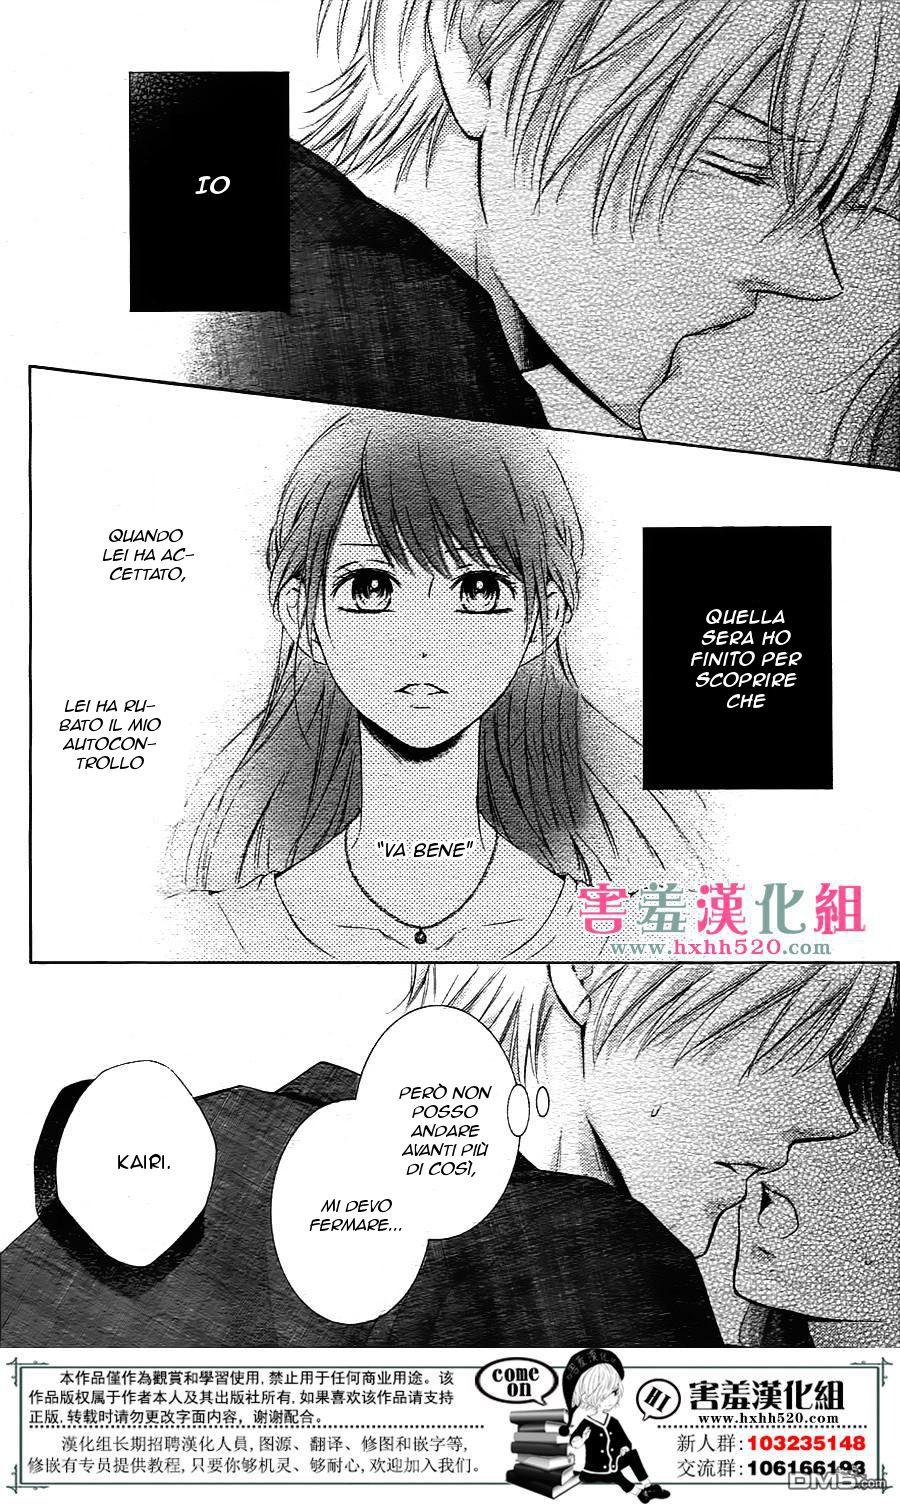 Watashi Wa Tensai O Katte Iru Vol 2 Ch 6 Page 37 Batoto Manga Anime Manga Romance Manga